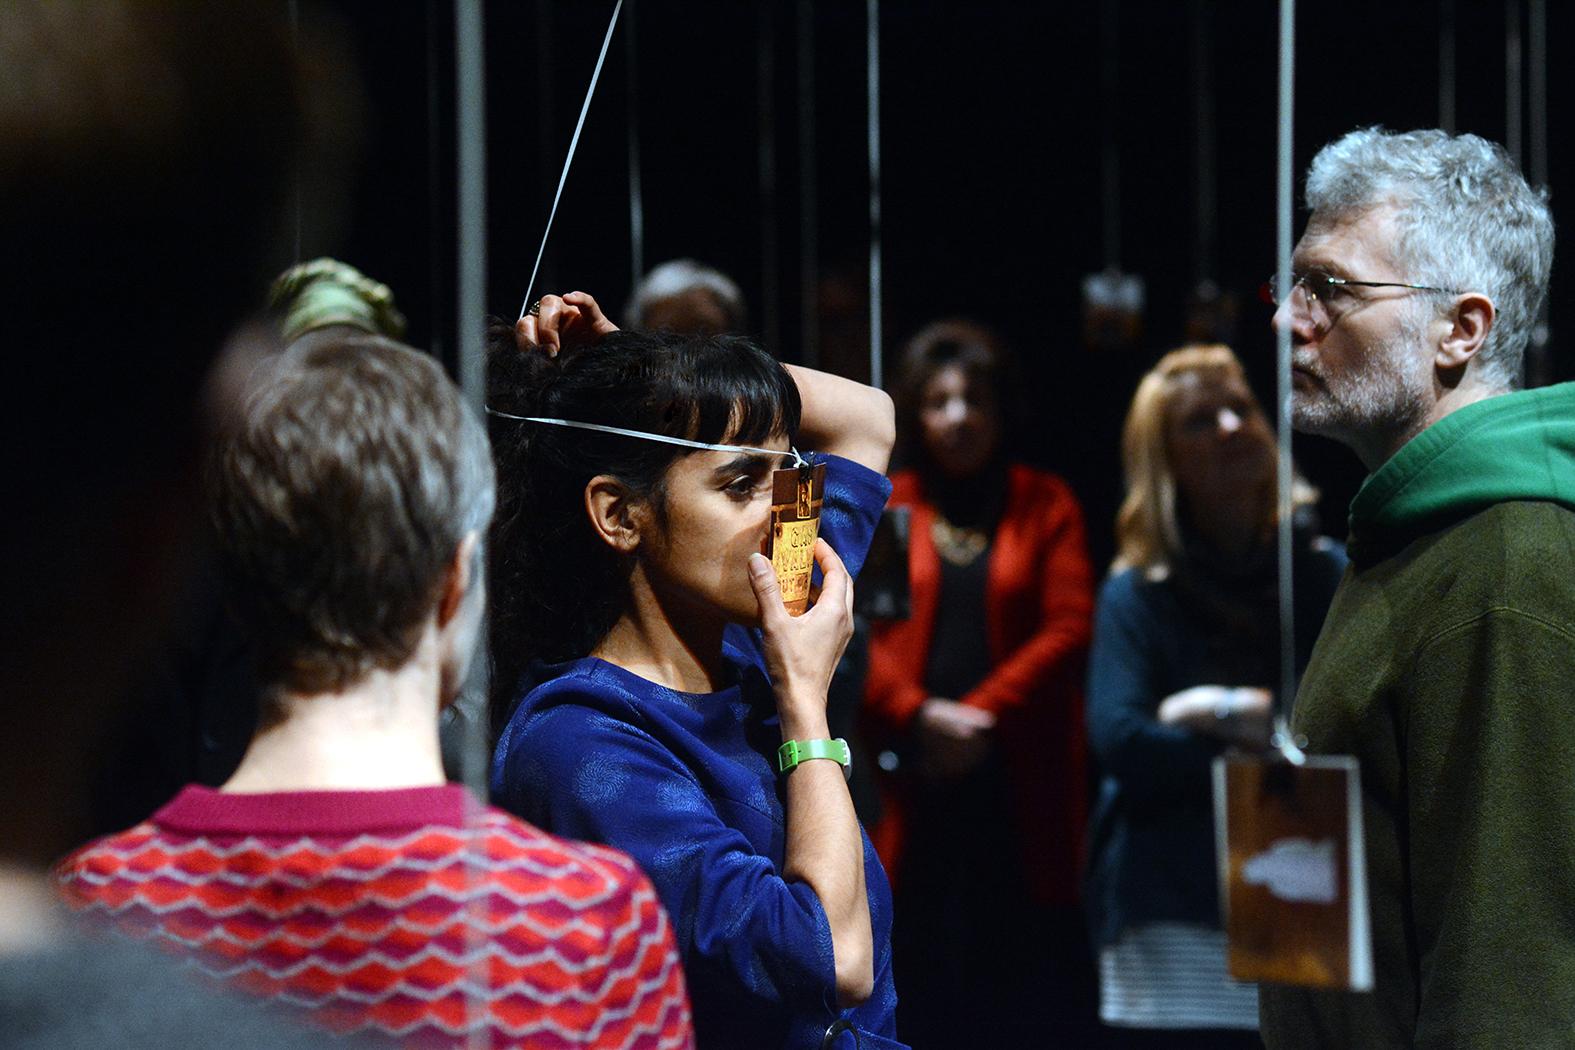 Tara Fatehi Irani, Mishandled Archive, Nuffield Theatre (Lancaster, 2020), © Darren Andrews